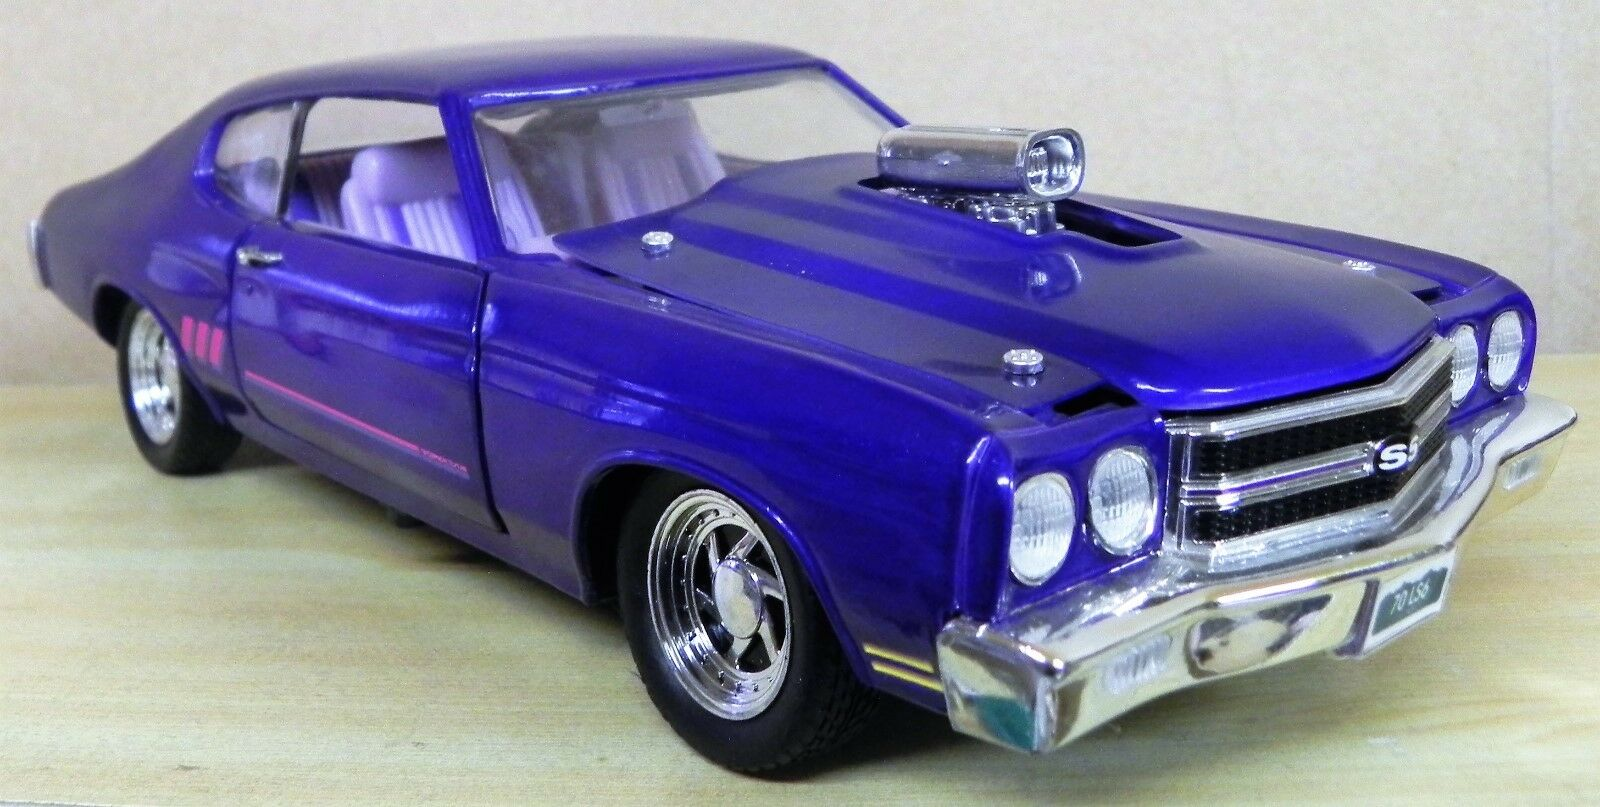 - 1 18 - Chevrolet Chevelle SS 1970 - Tuning - Mauve - ERTL   Rare